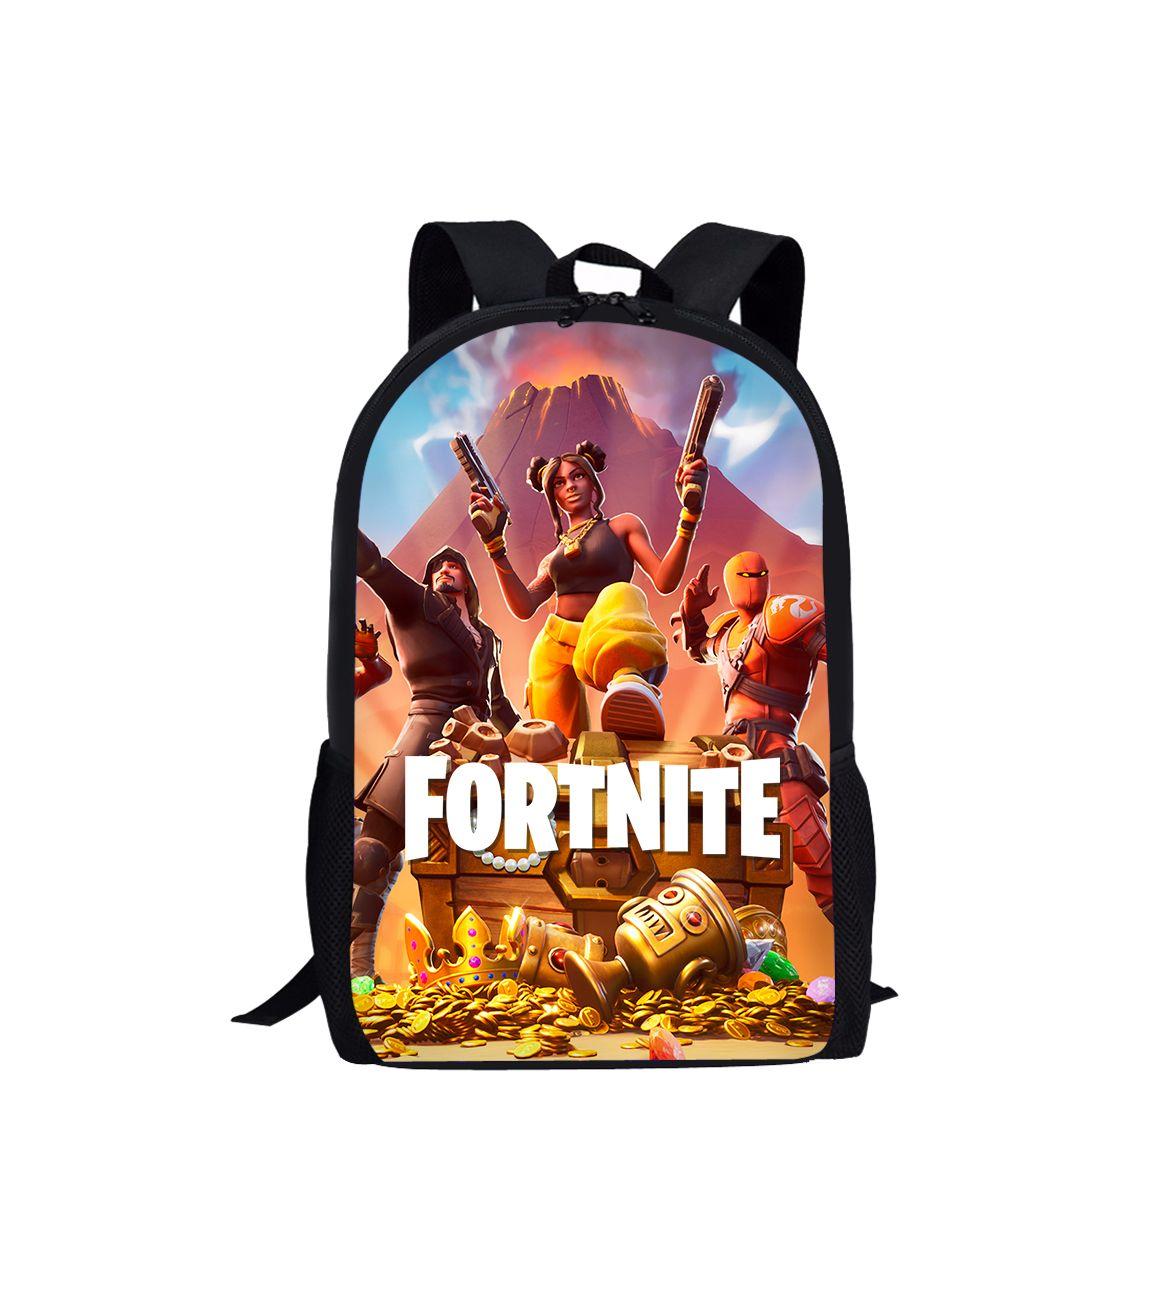 eec7bc6cf6b5 Fortnite Season 9 Backpack - Fortnite School Bag - Fortnite Bag in ...